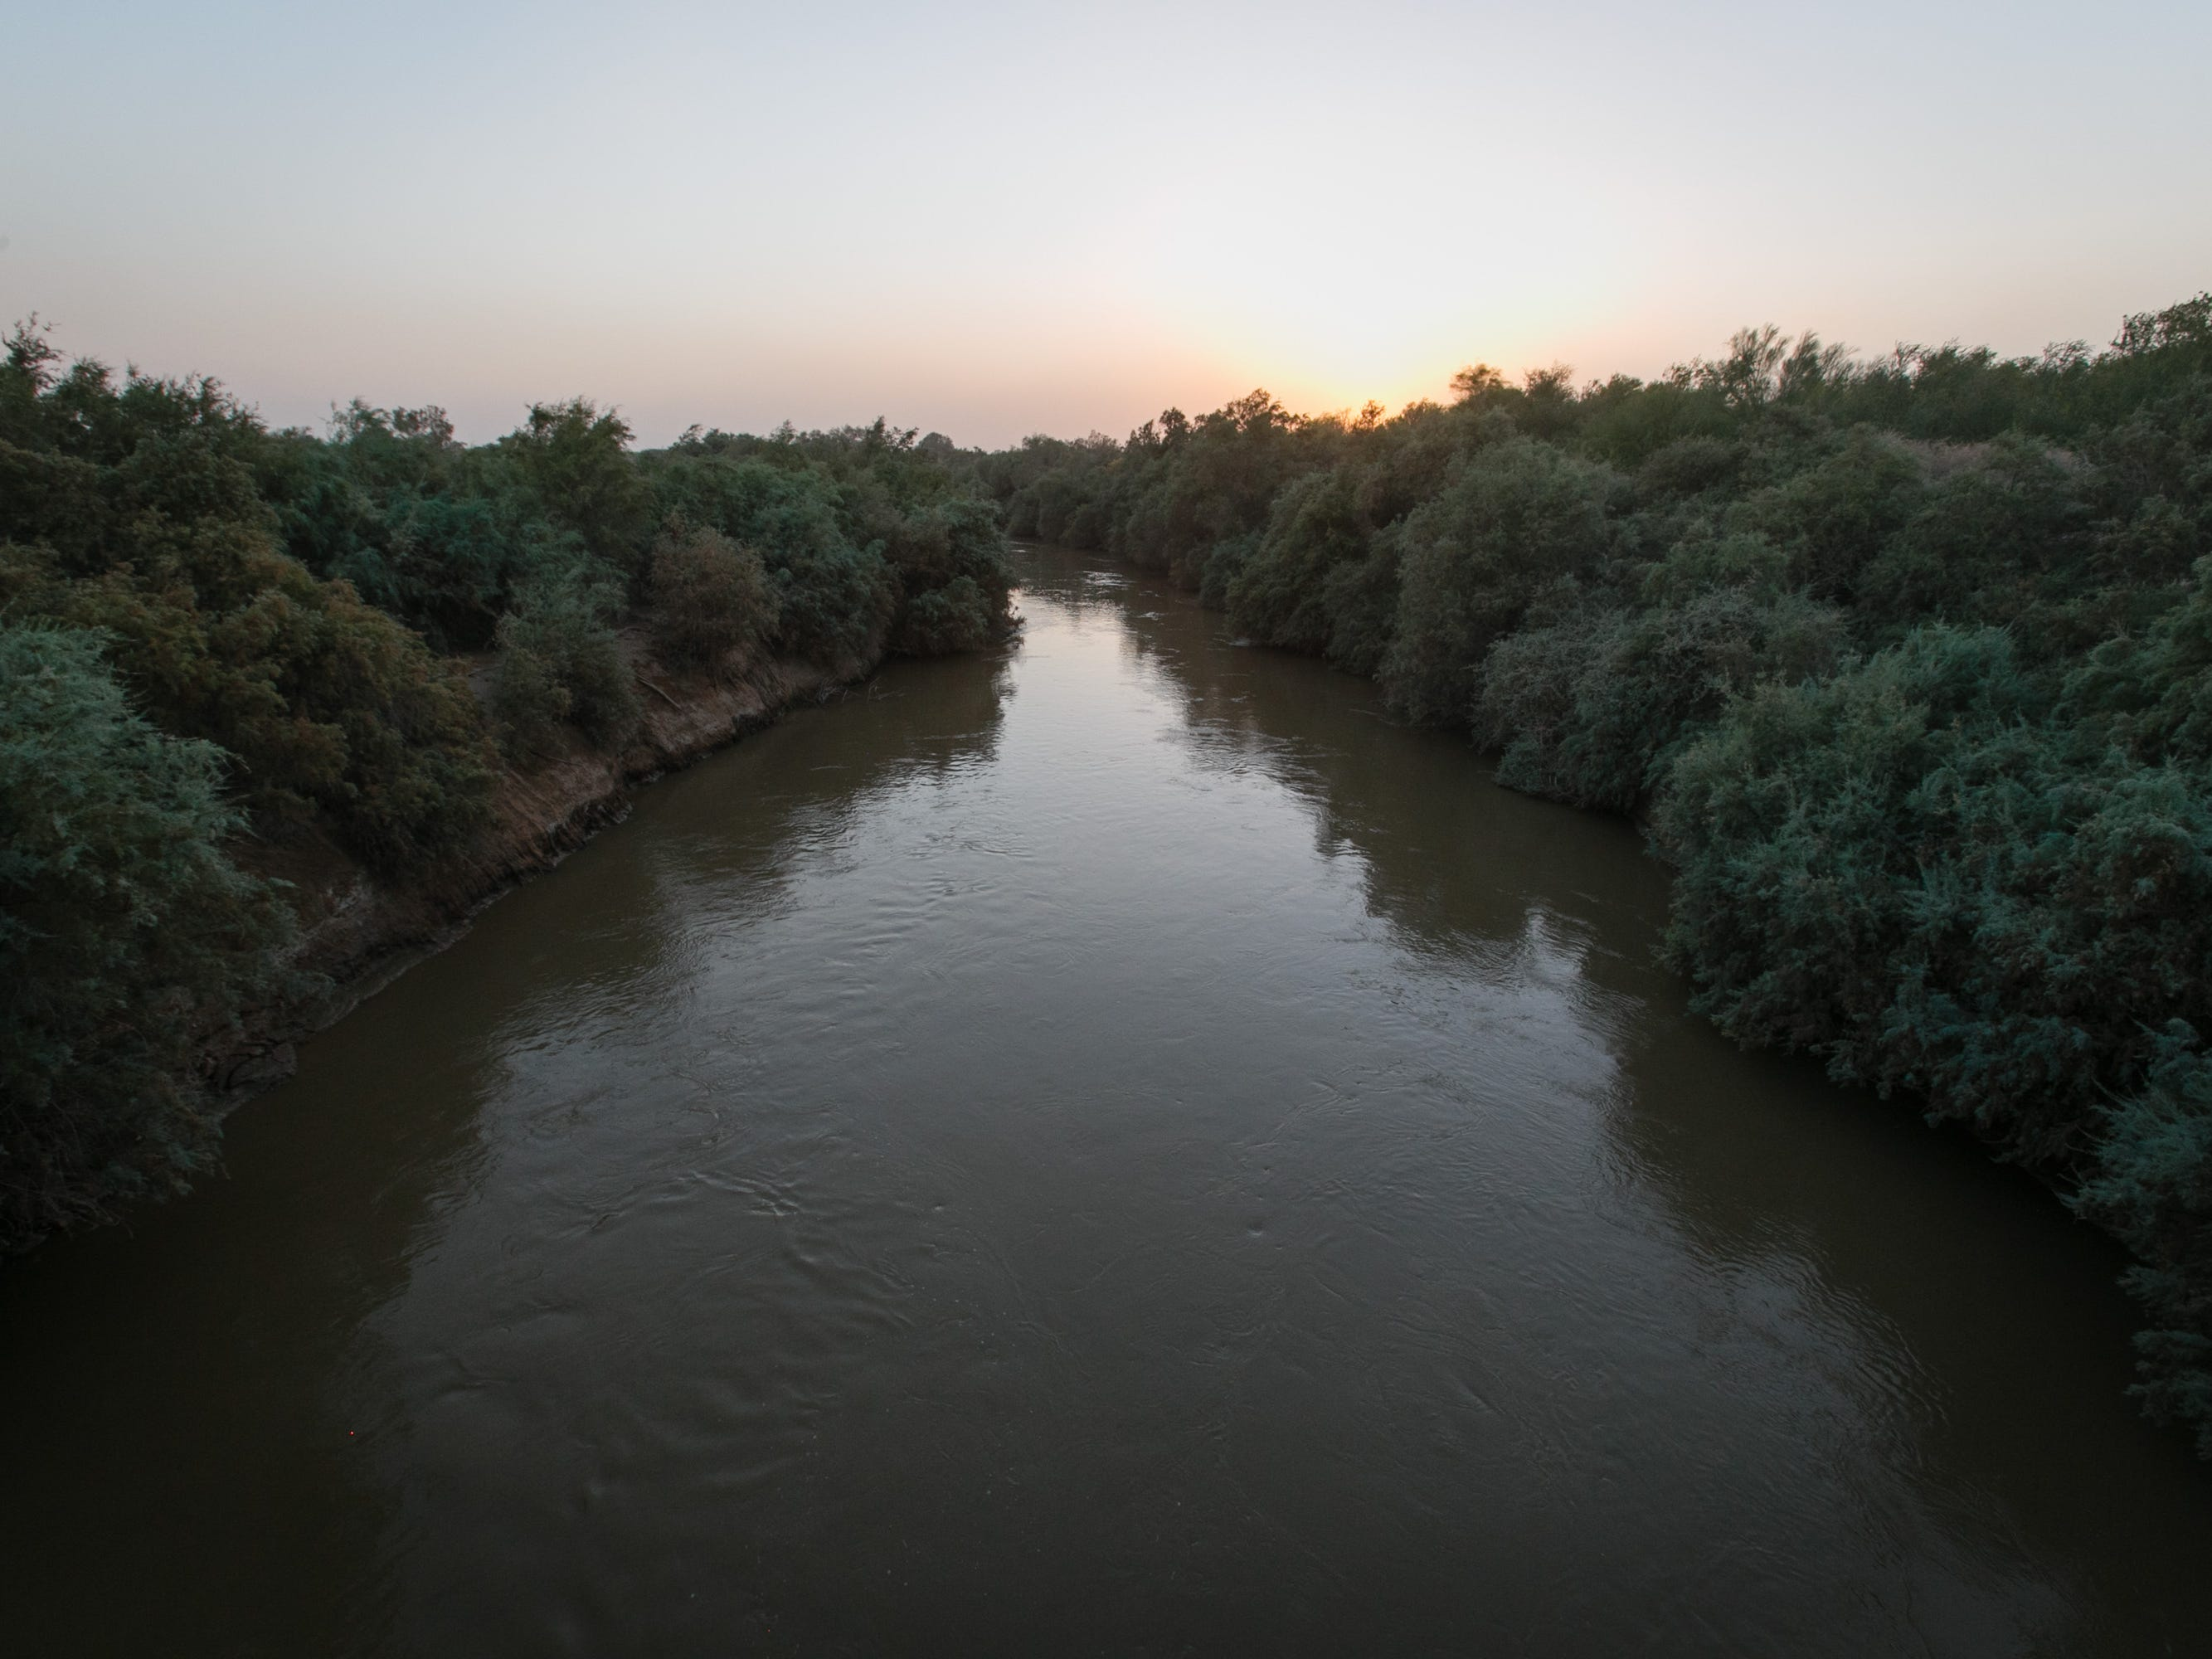 The New River flows through Brawley toward the Salton Sea.